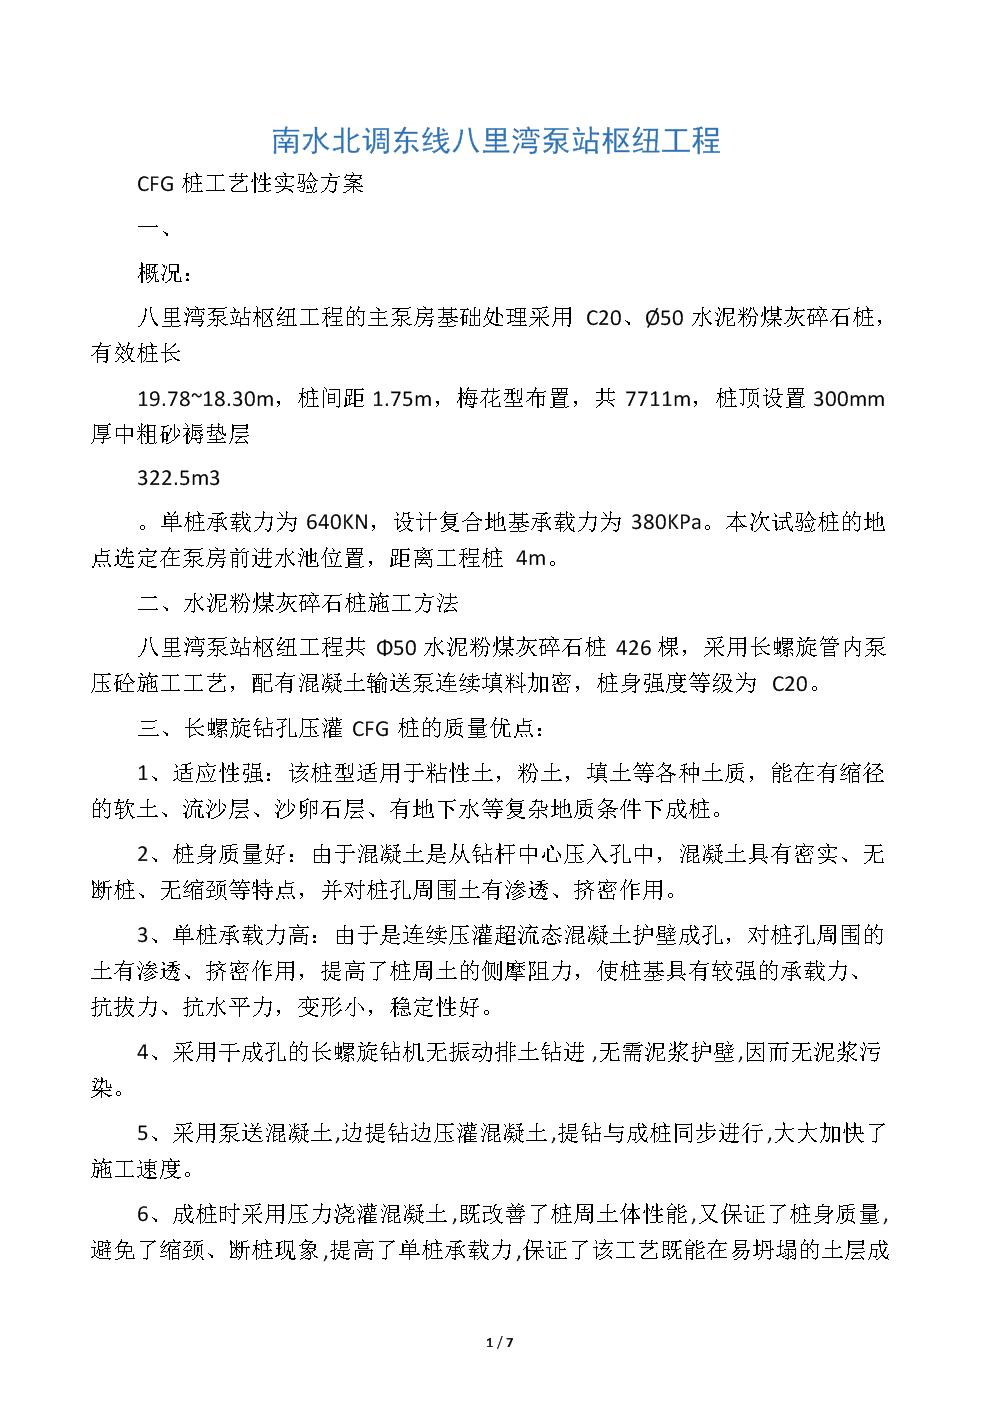 CFG桩基实验方案.docx